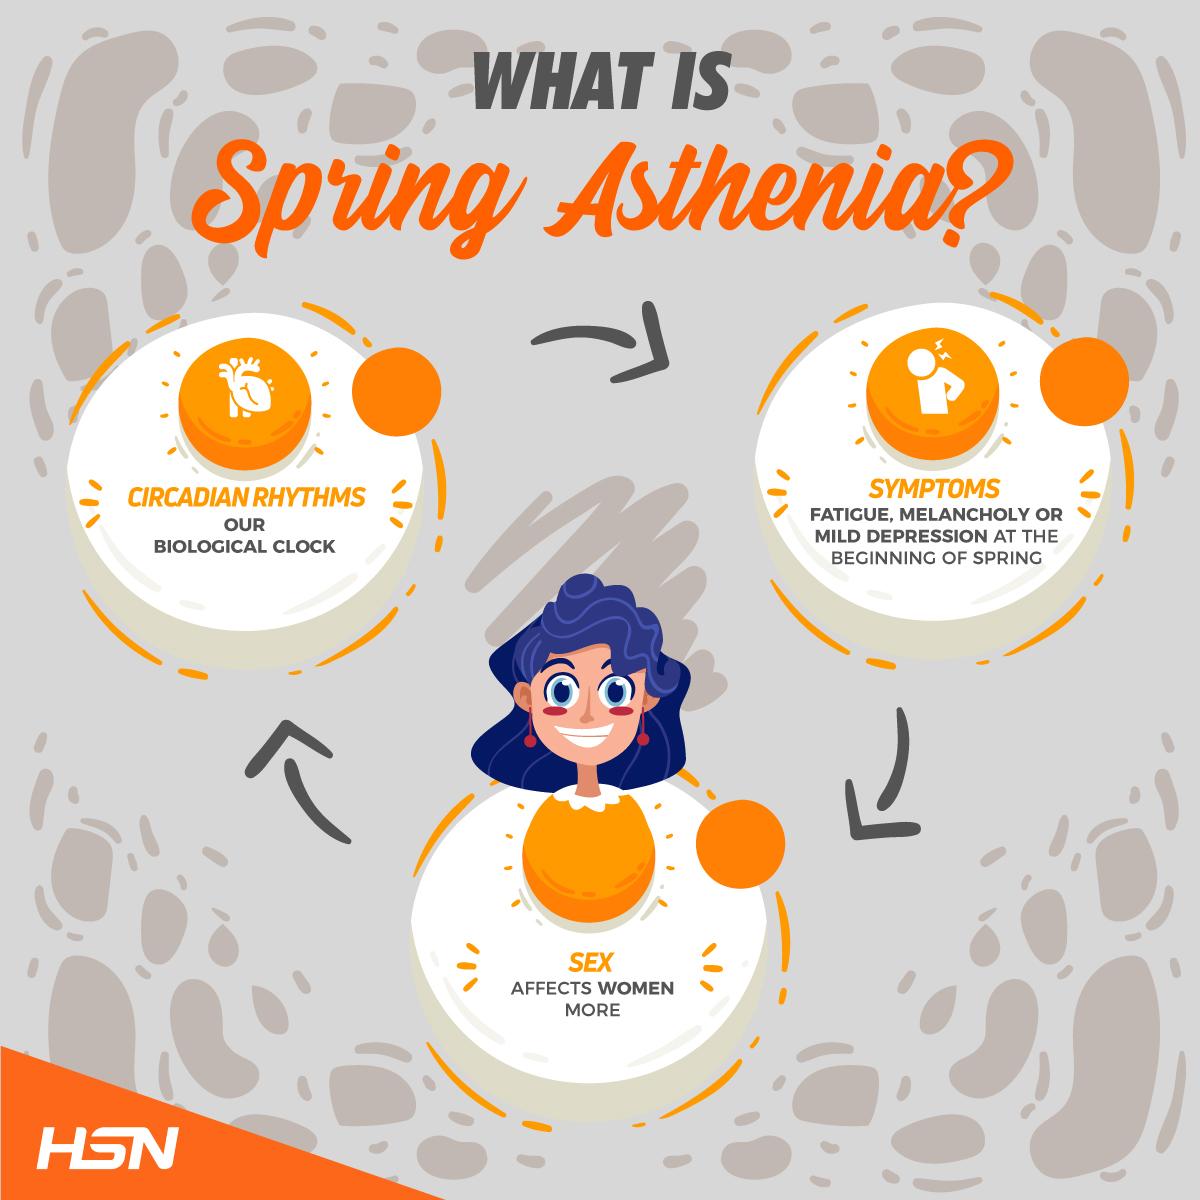 Spring asthenia definition